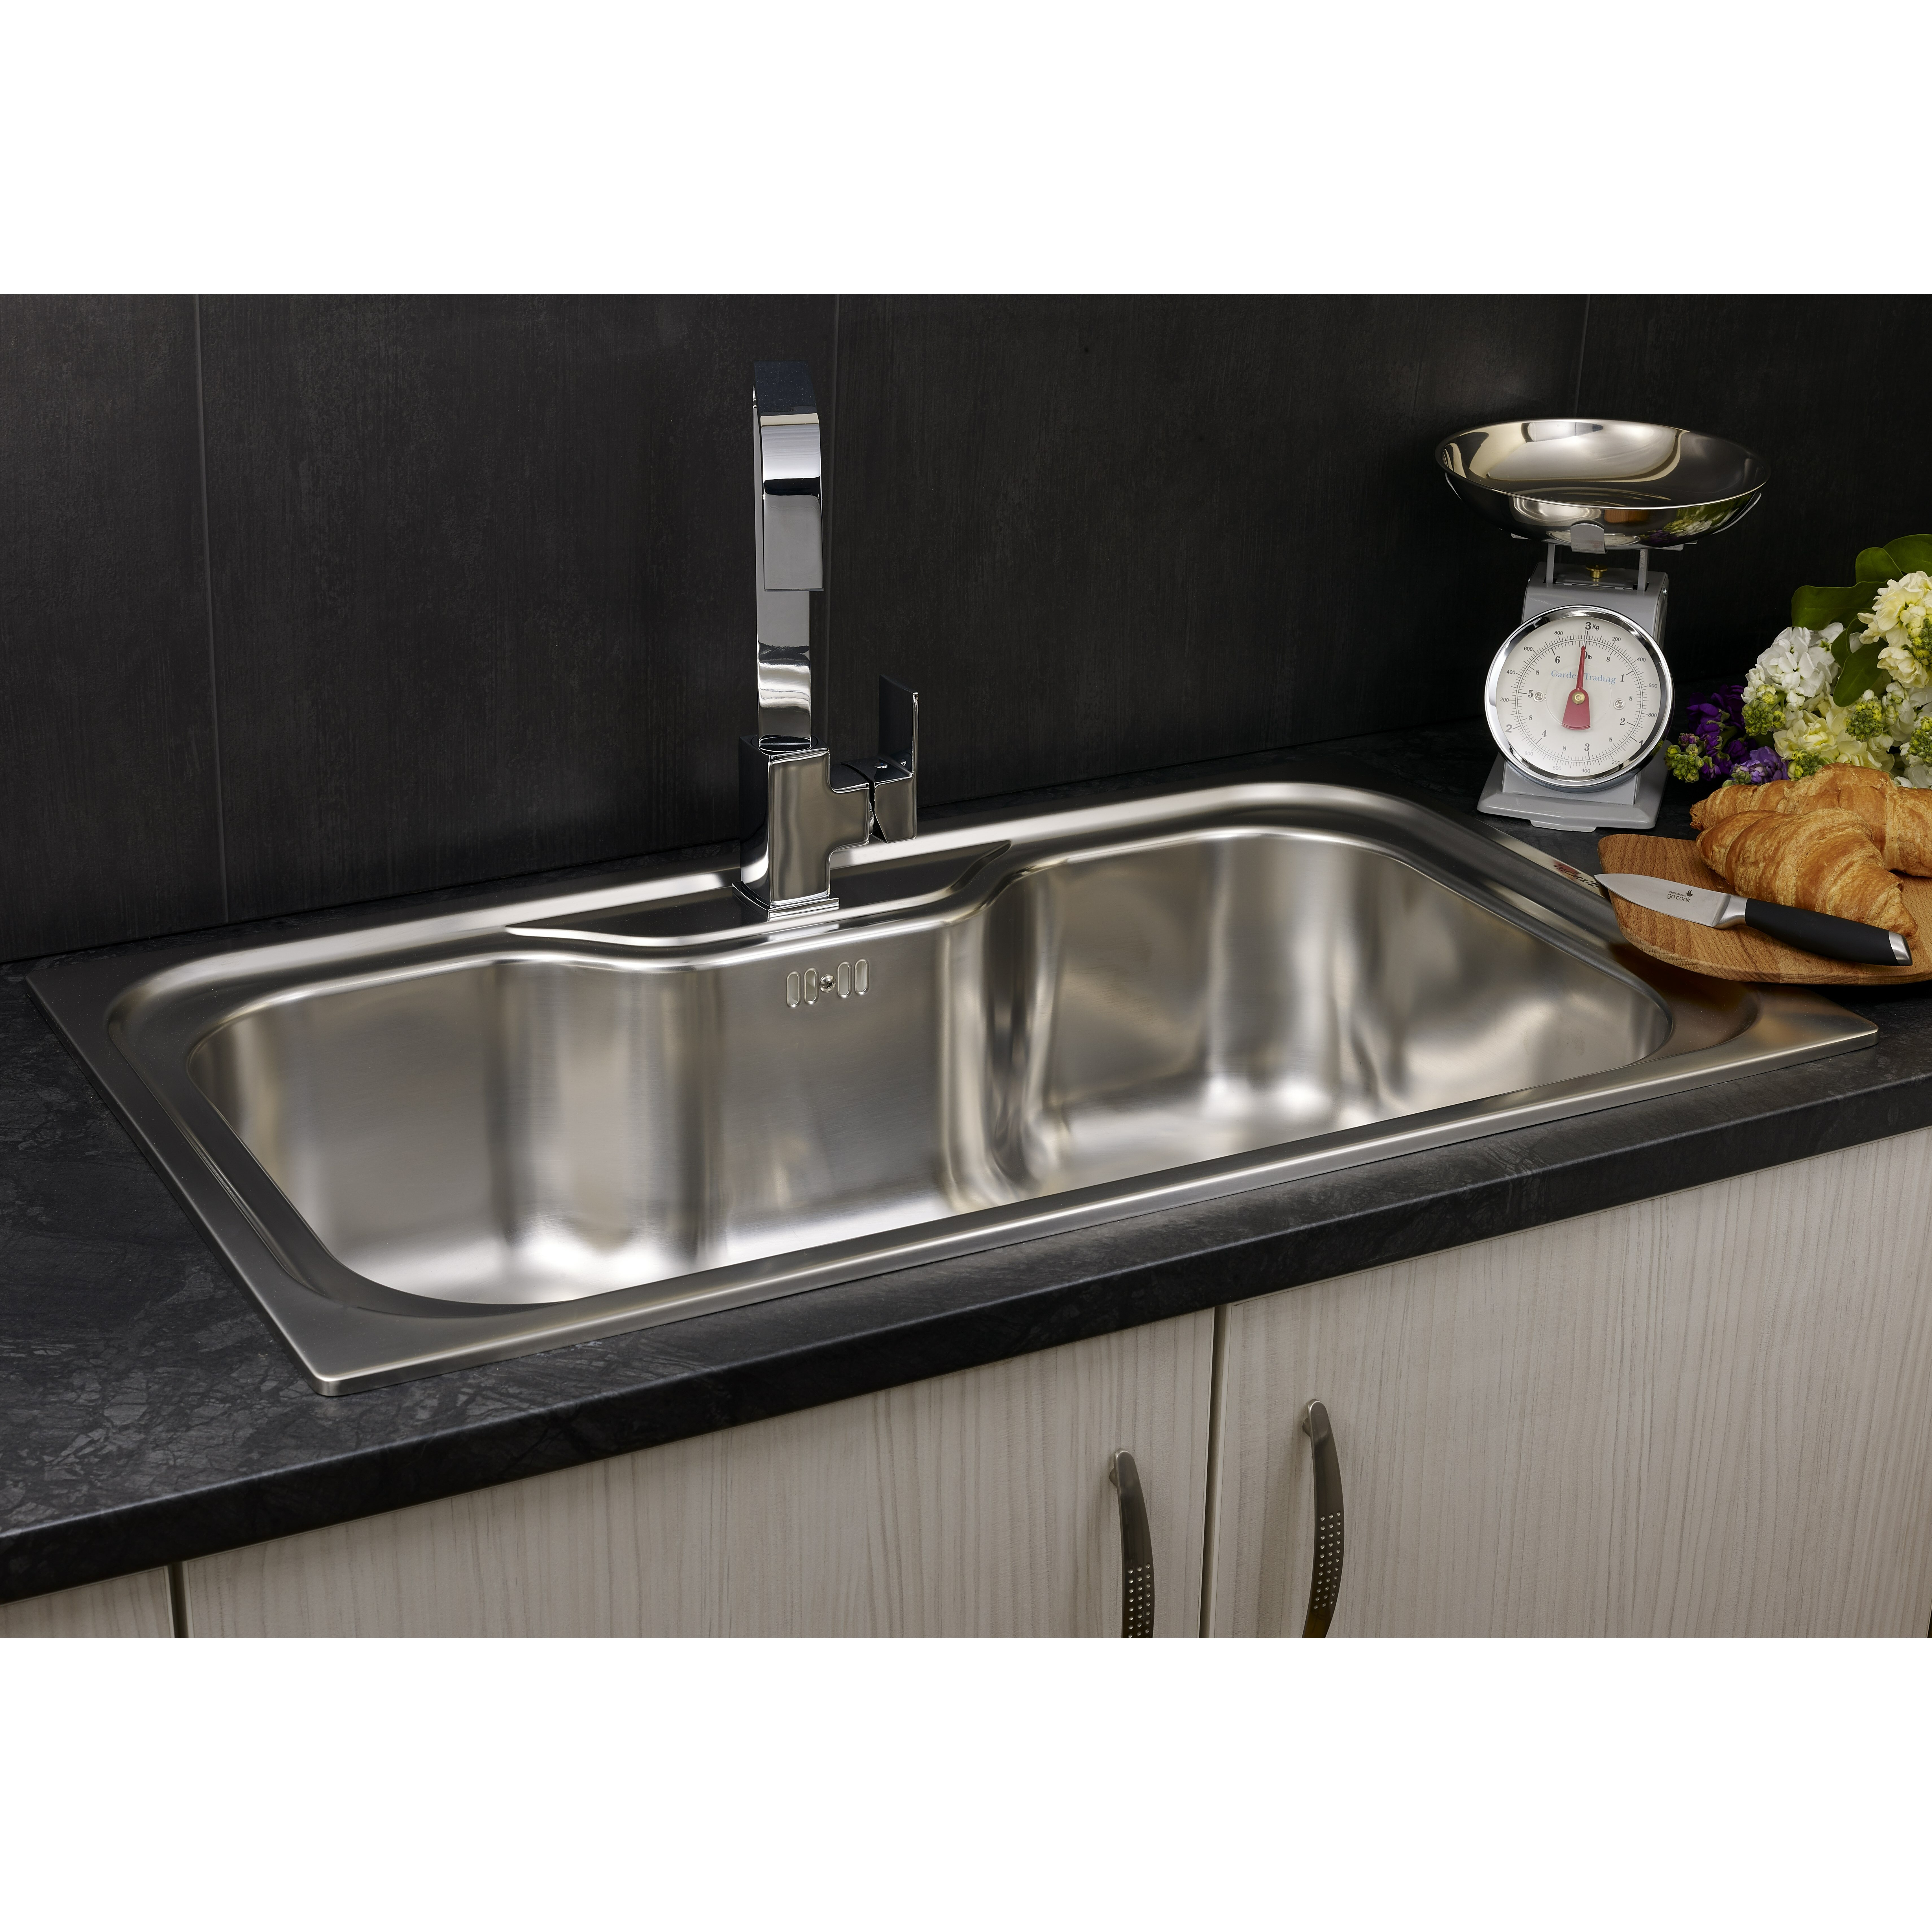 Reginox 86cm X 51cm Single Bowl Kitchen Sink Reviews Wayfair Uk